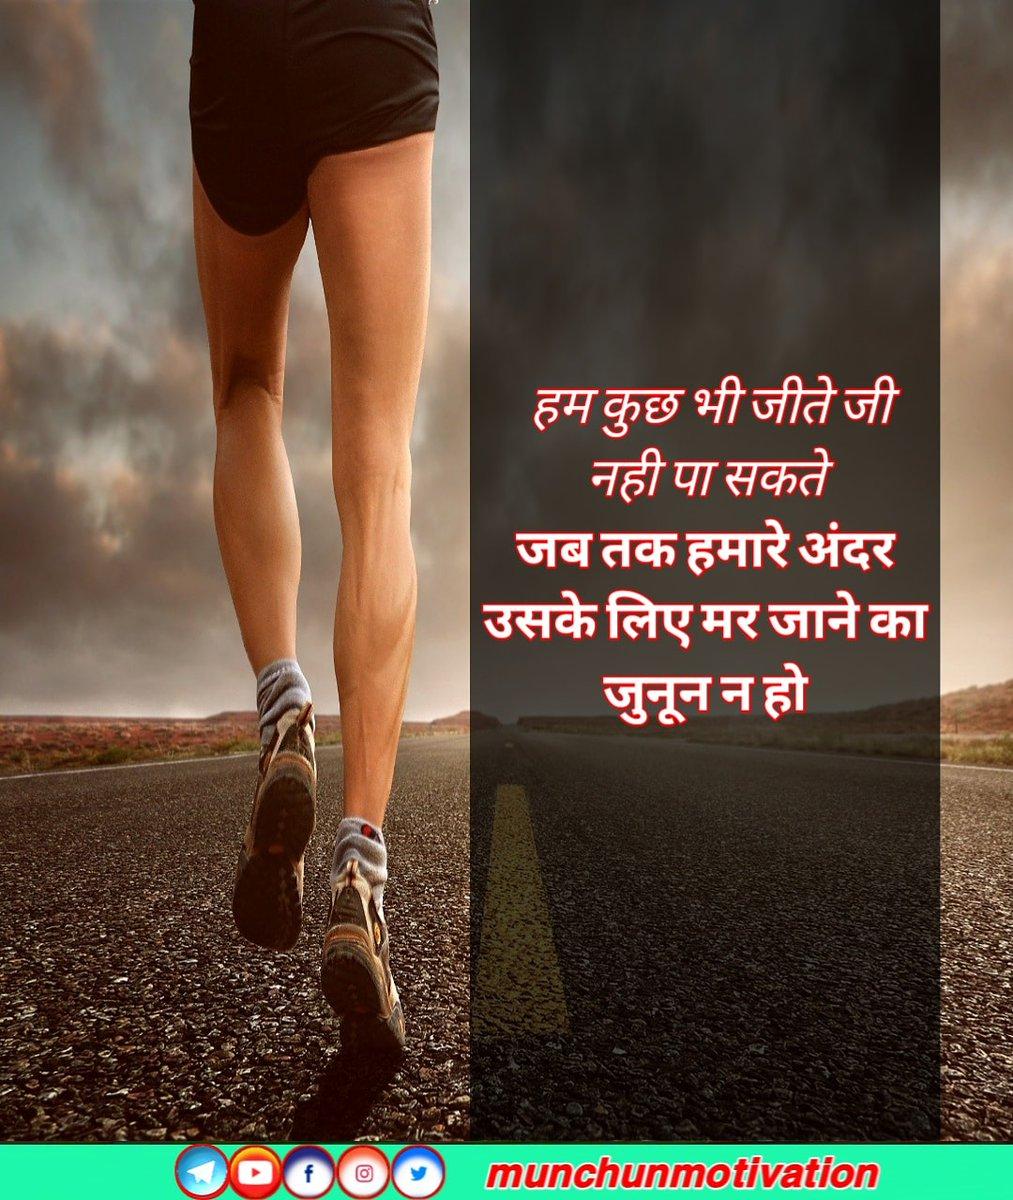 Motivation Quotes. #goodmorning #goodmorningpost #motivationquote #motivation #munchunmotivate #bestquotes #bestmotivation #suvichar #lifelesson #life #sikh #bestmotivationalquotes #motivationalquotes #indianmotivation #hindimotivationalquotes #hindimotivationpic.twitter.com/6BtkkXwbPg